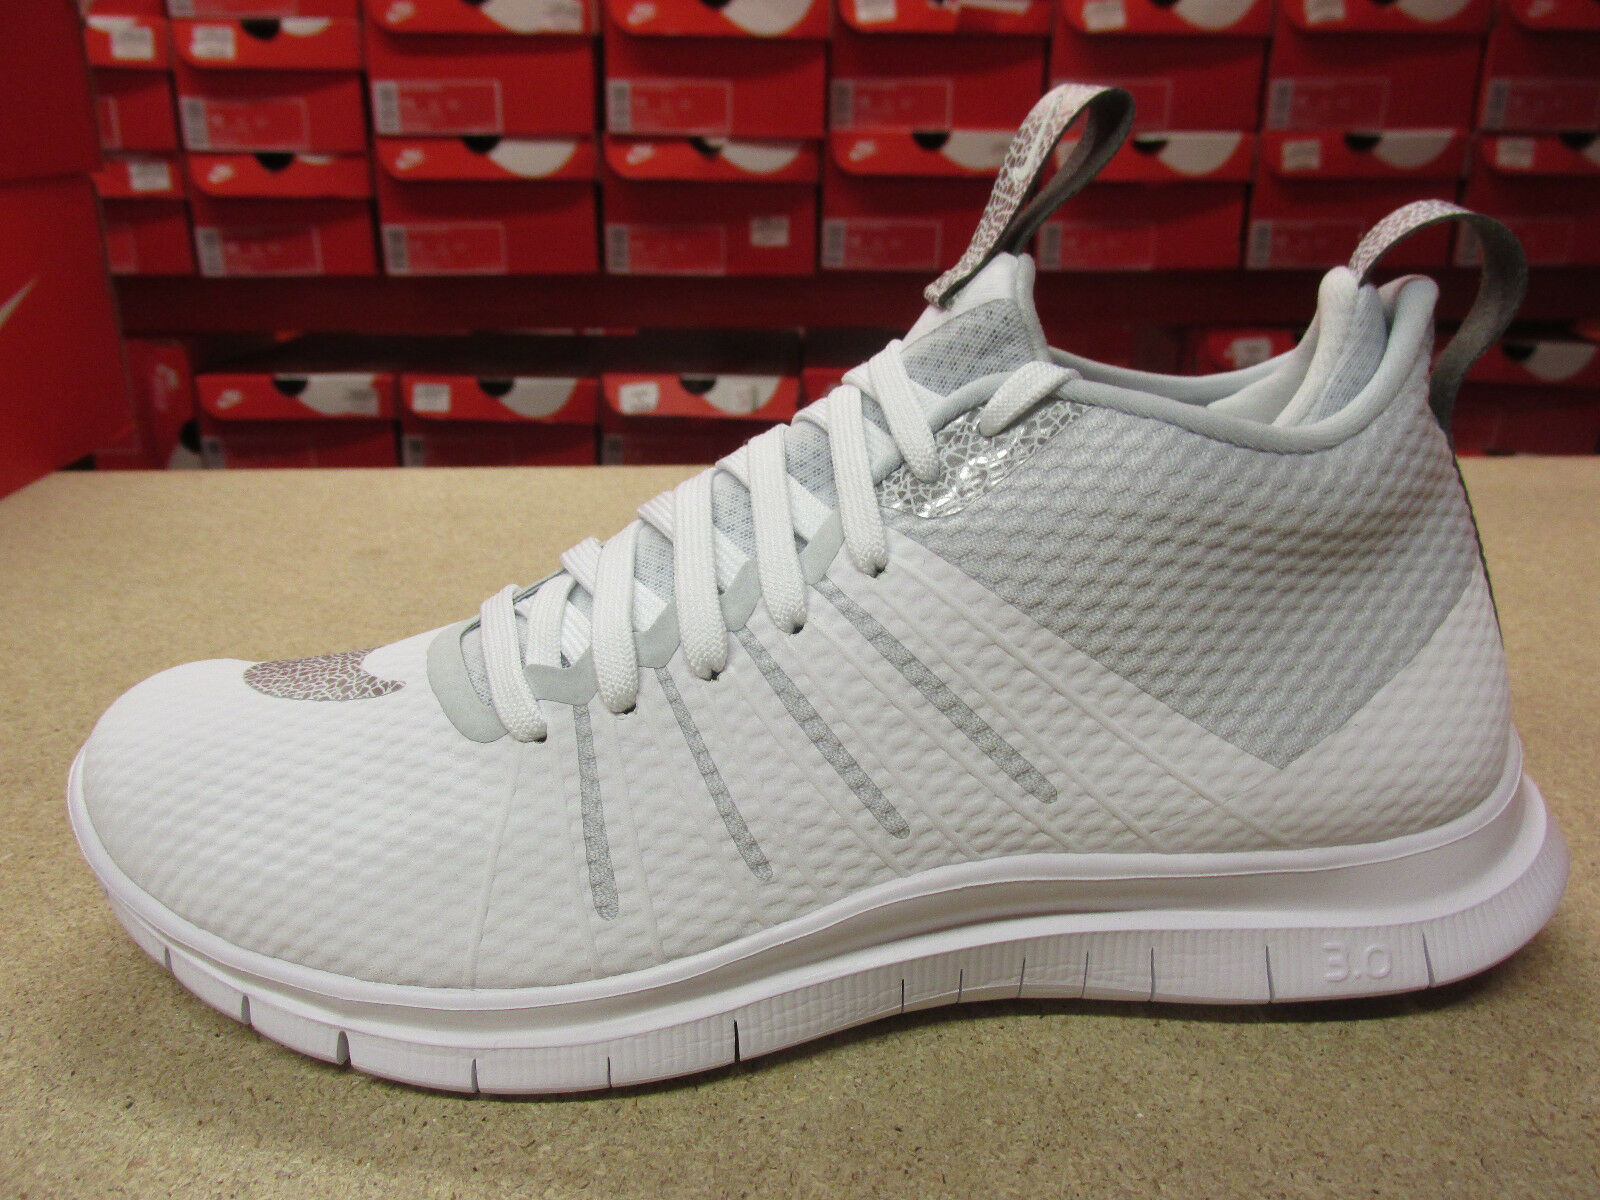 nike free hypervenom 2 FS mens hi top trainers 805890 101 sneakers shoes